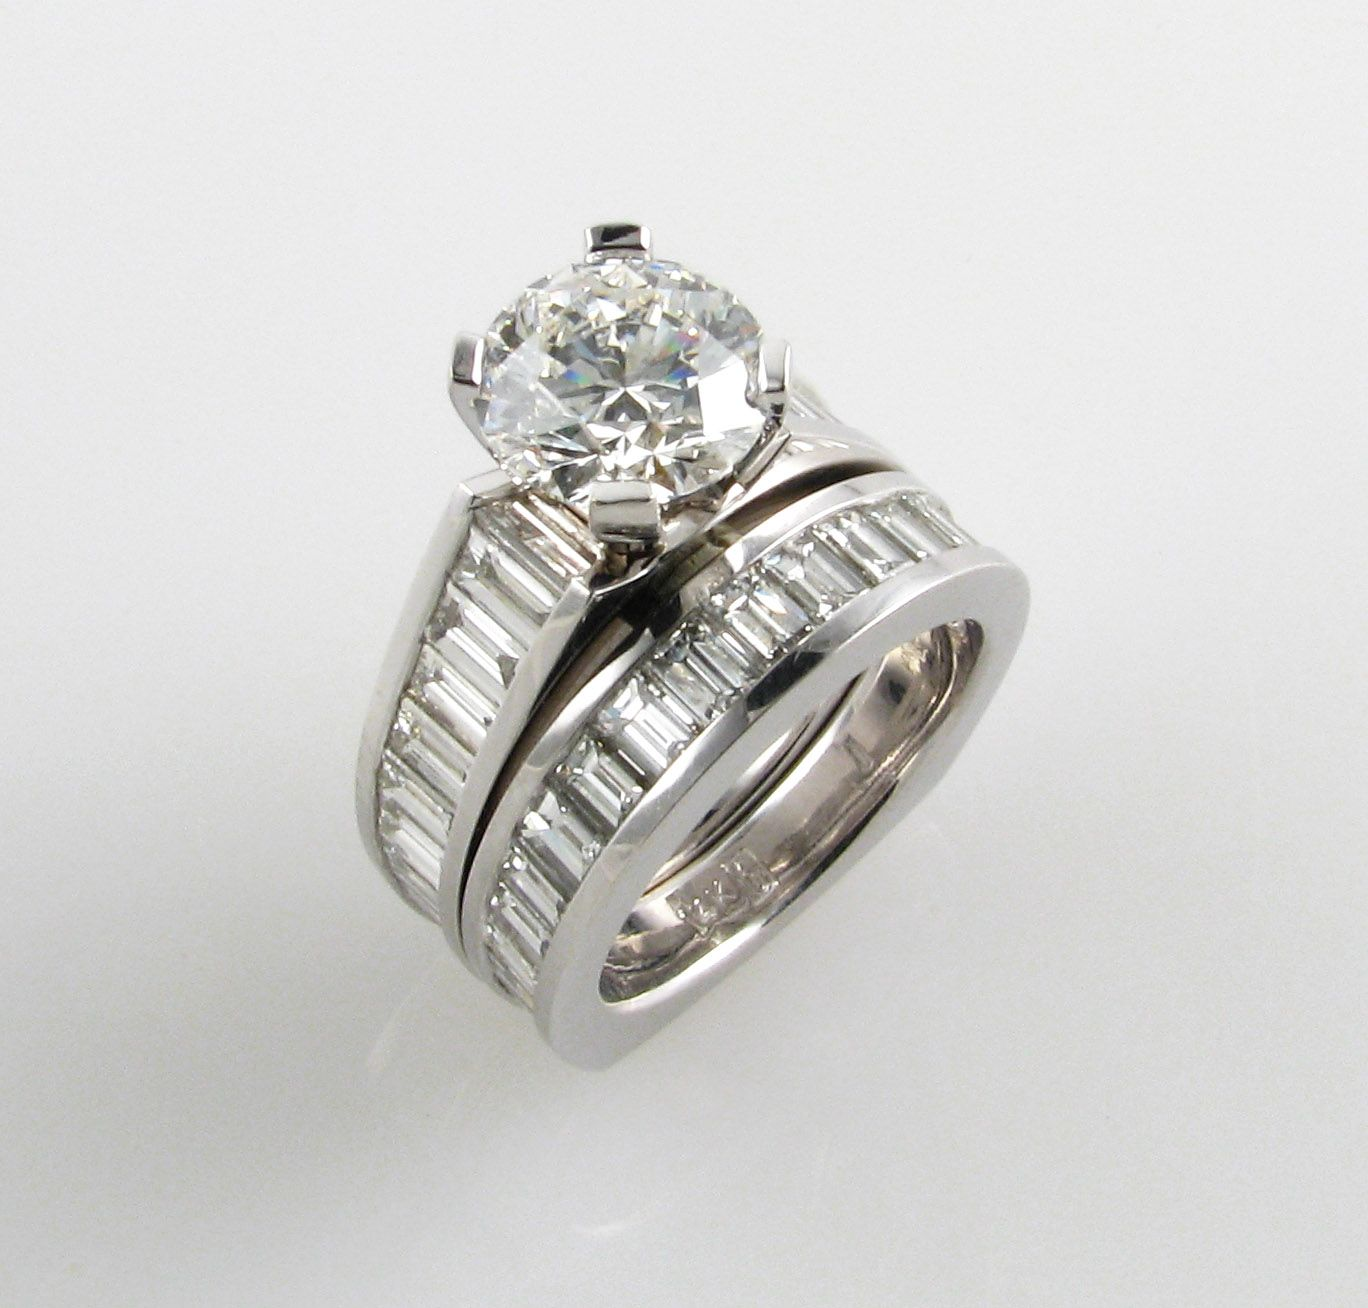 Https Www Jewelrybygauthier Stunning Wedding Band And Engagement